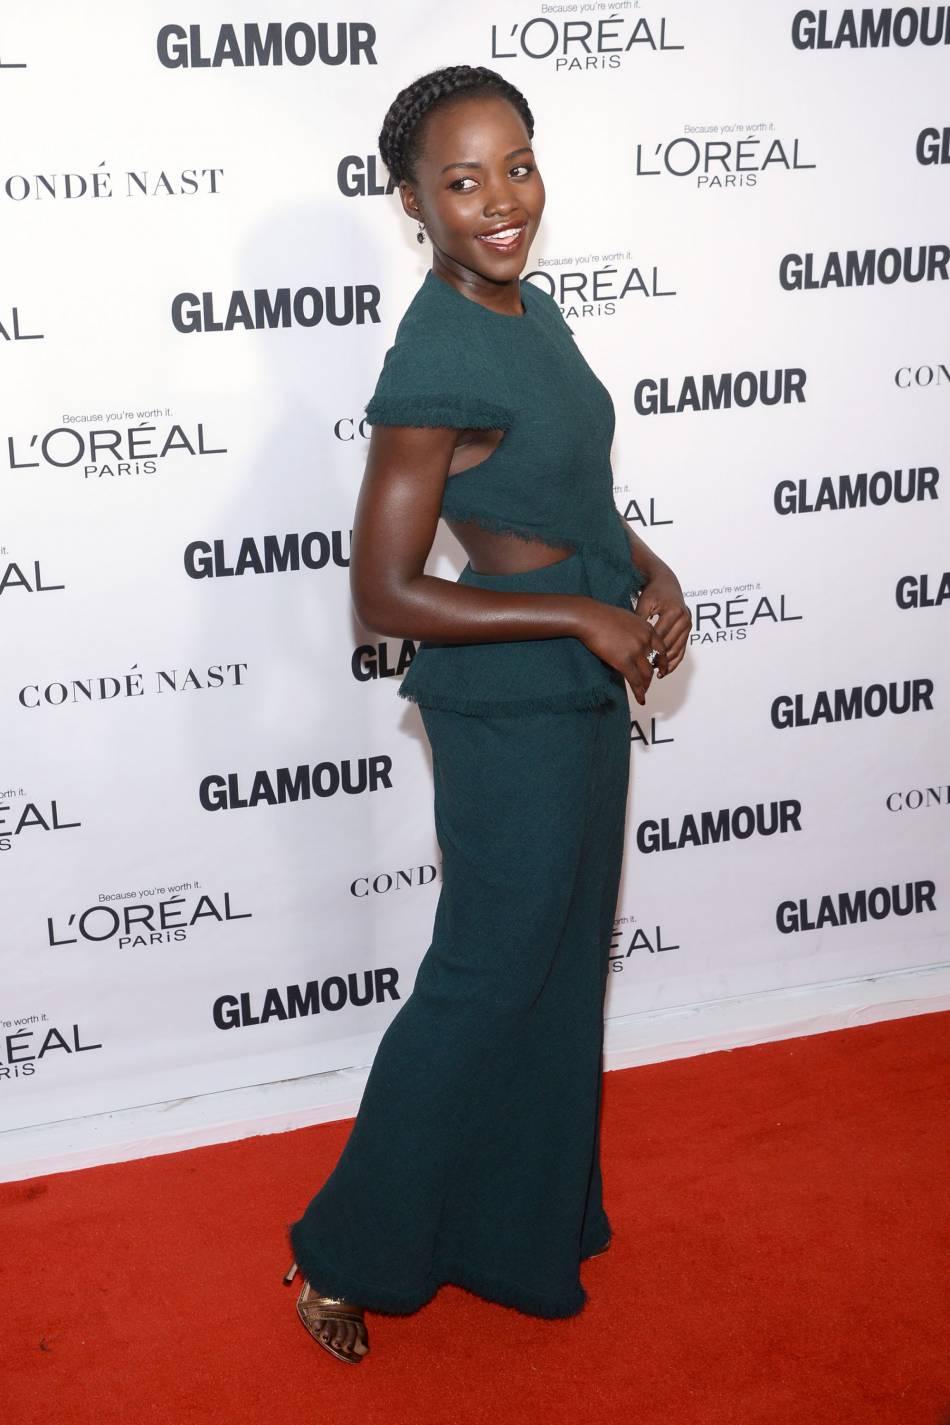 Lupita Nyong'o aux Glamour Awards le 9 novembre 2015 à New York.